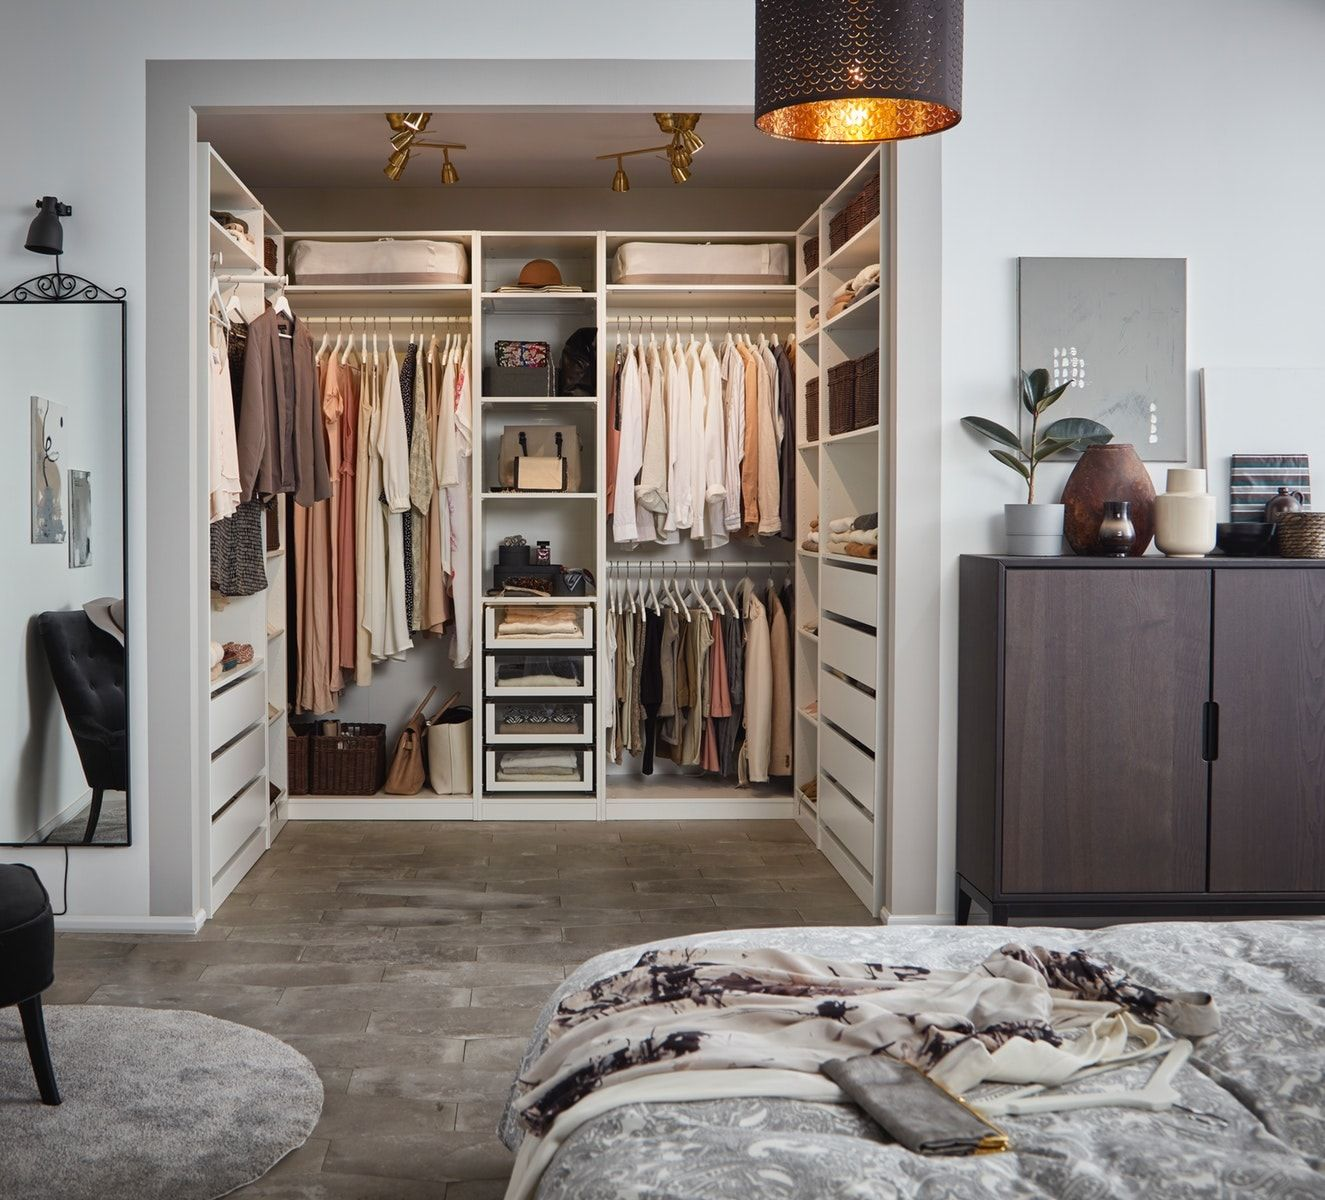 Begehbarer Kleiderschrank Idee Begehbarer Kleiderschrank Ideen Begehbarer Kleiderschrank Kleiderschrank Ideen